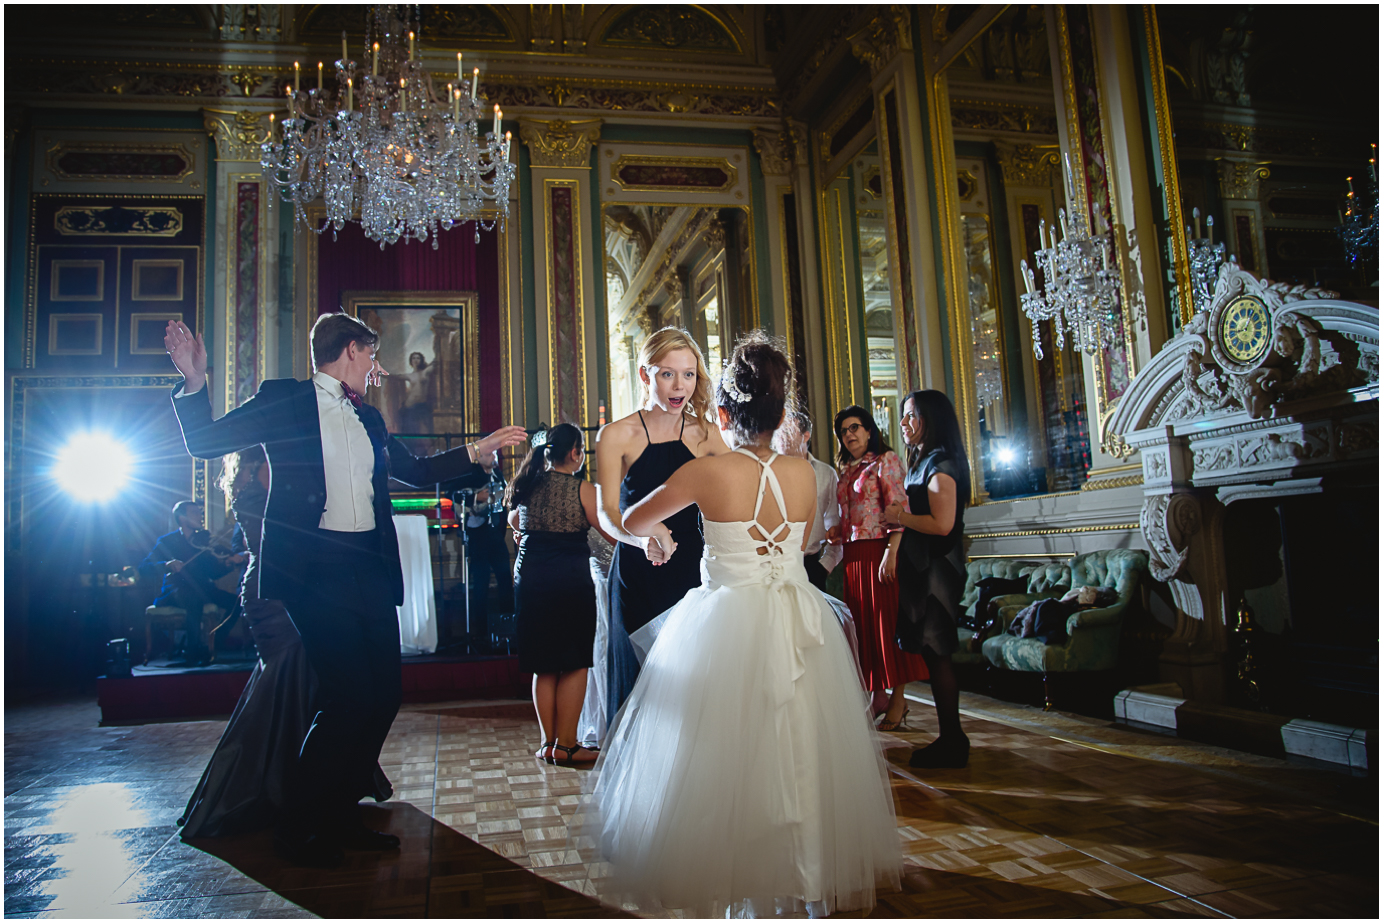 iranian wedding photographer 224 - Drapers Hall London Wedding Photographer